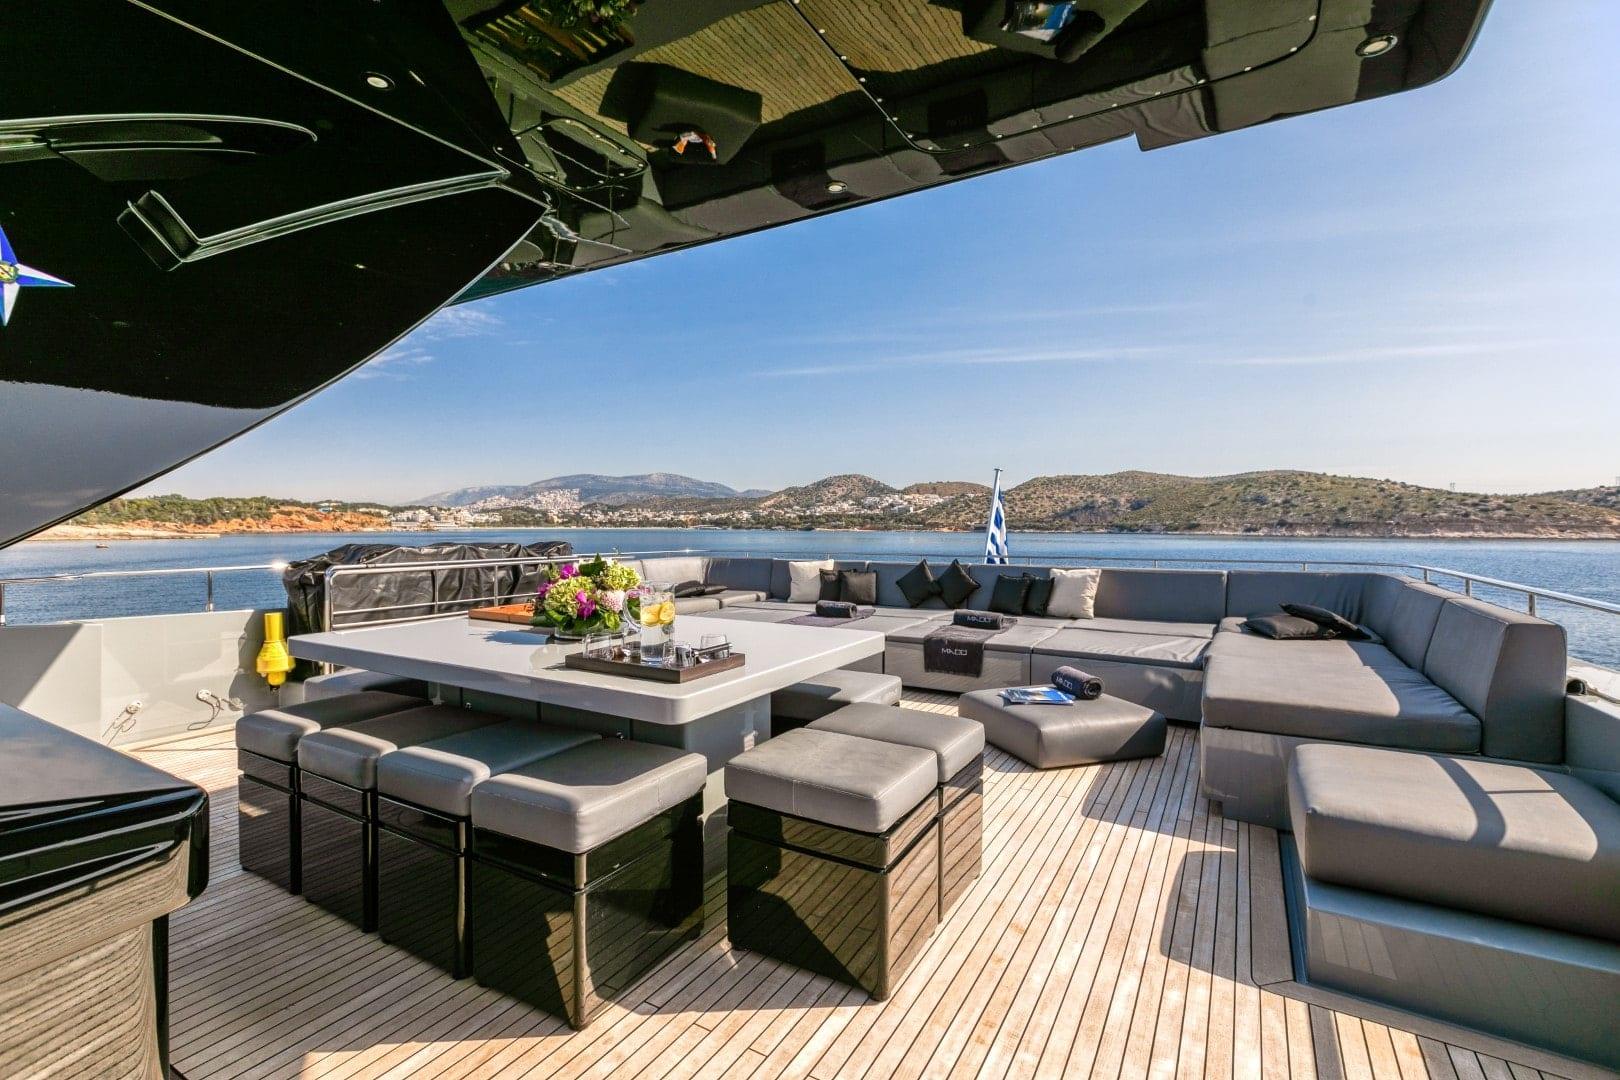 mado-motor-yacht-exterior (2)